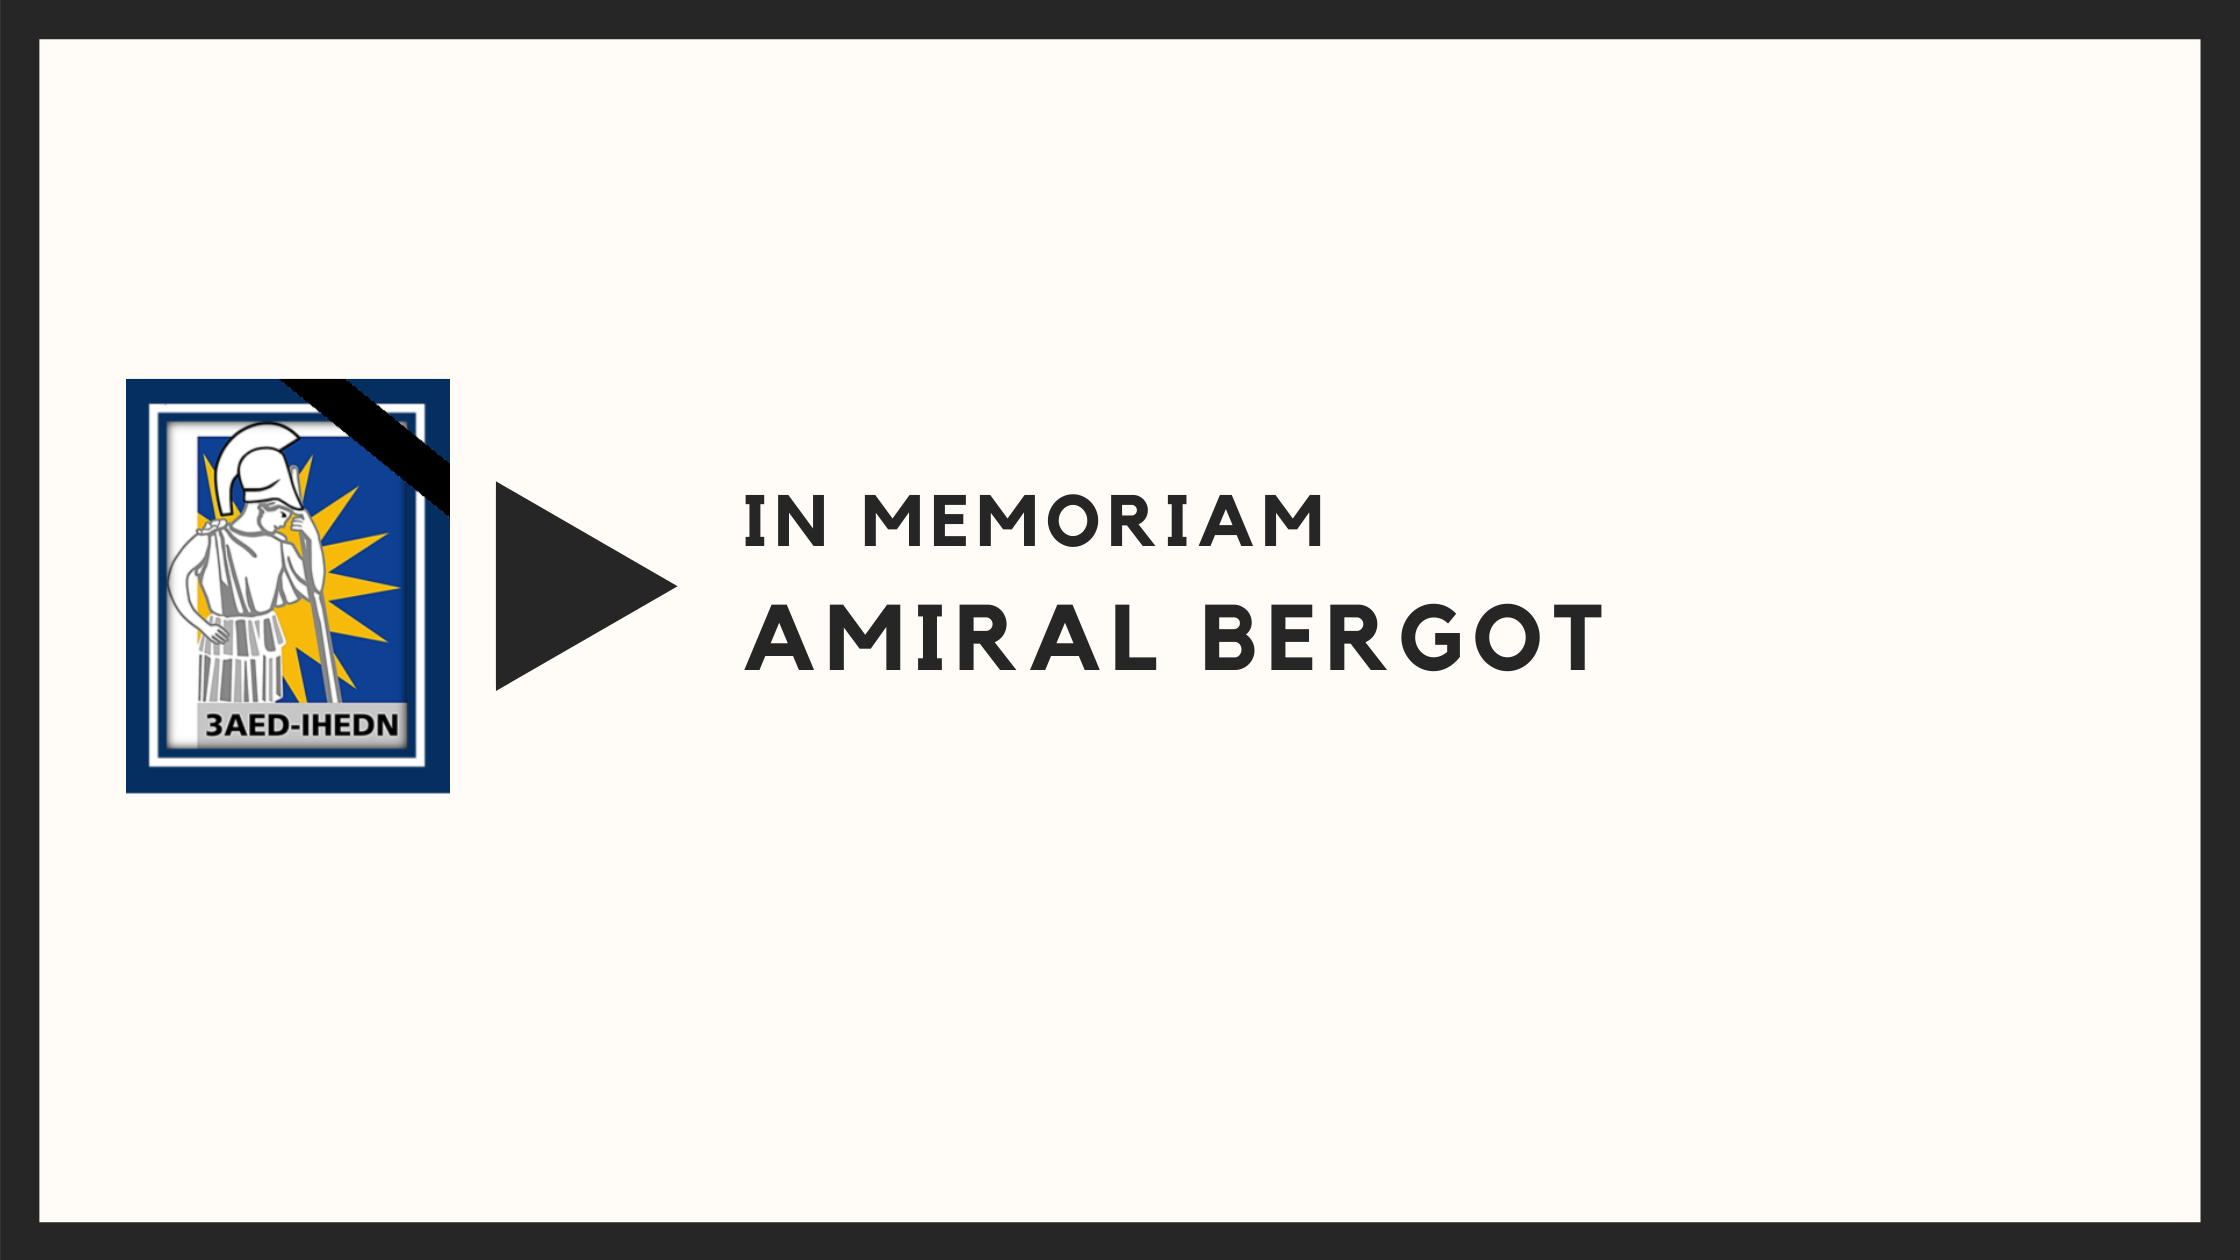 IN MEMORIAM – AMIRAL BERGOT